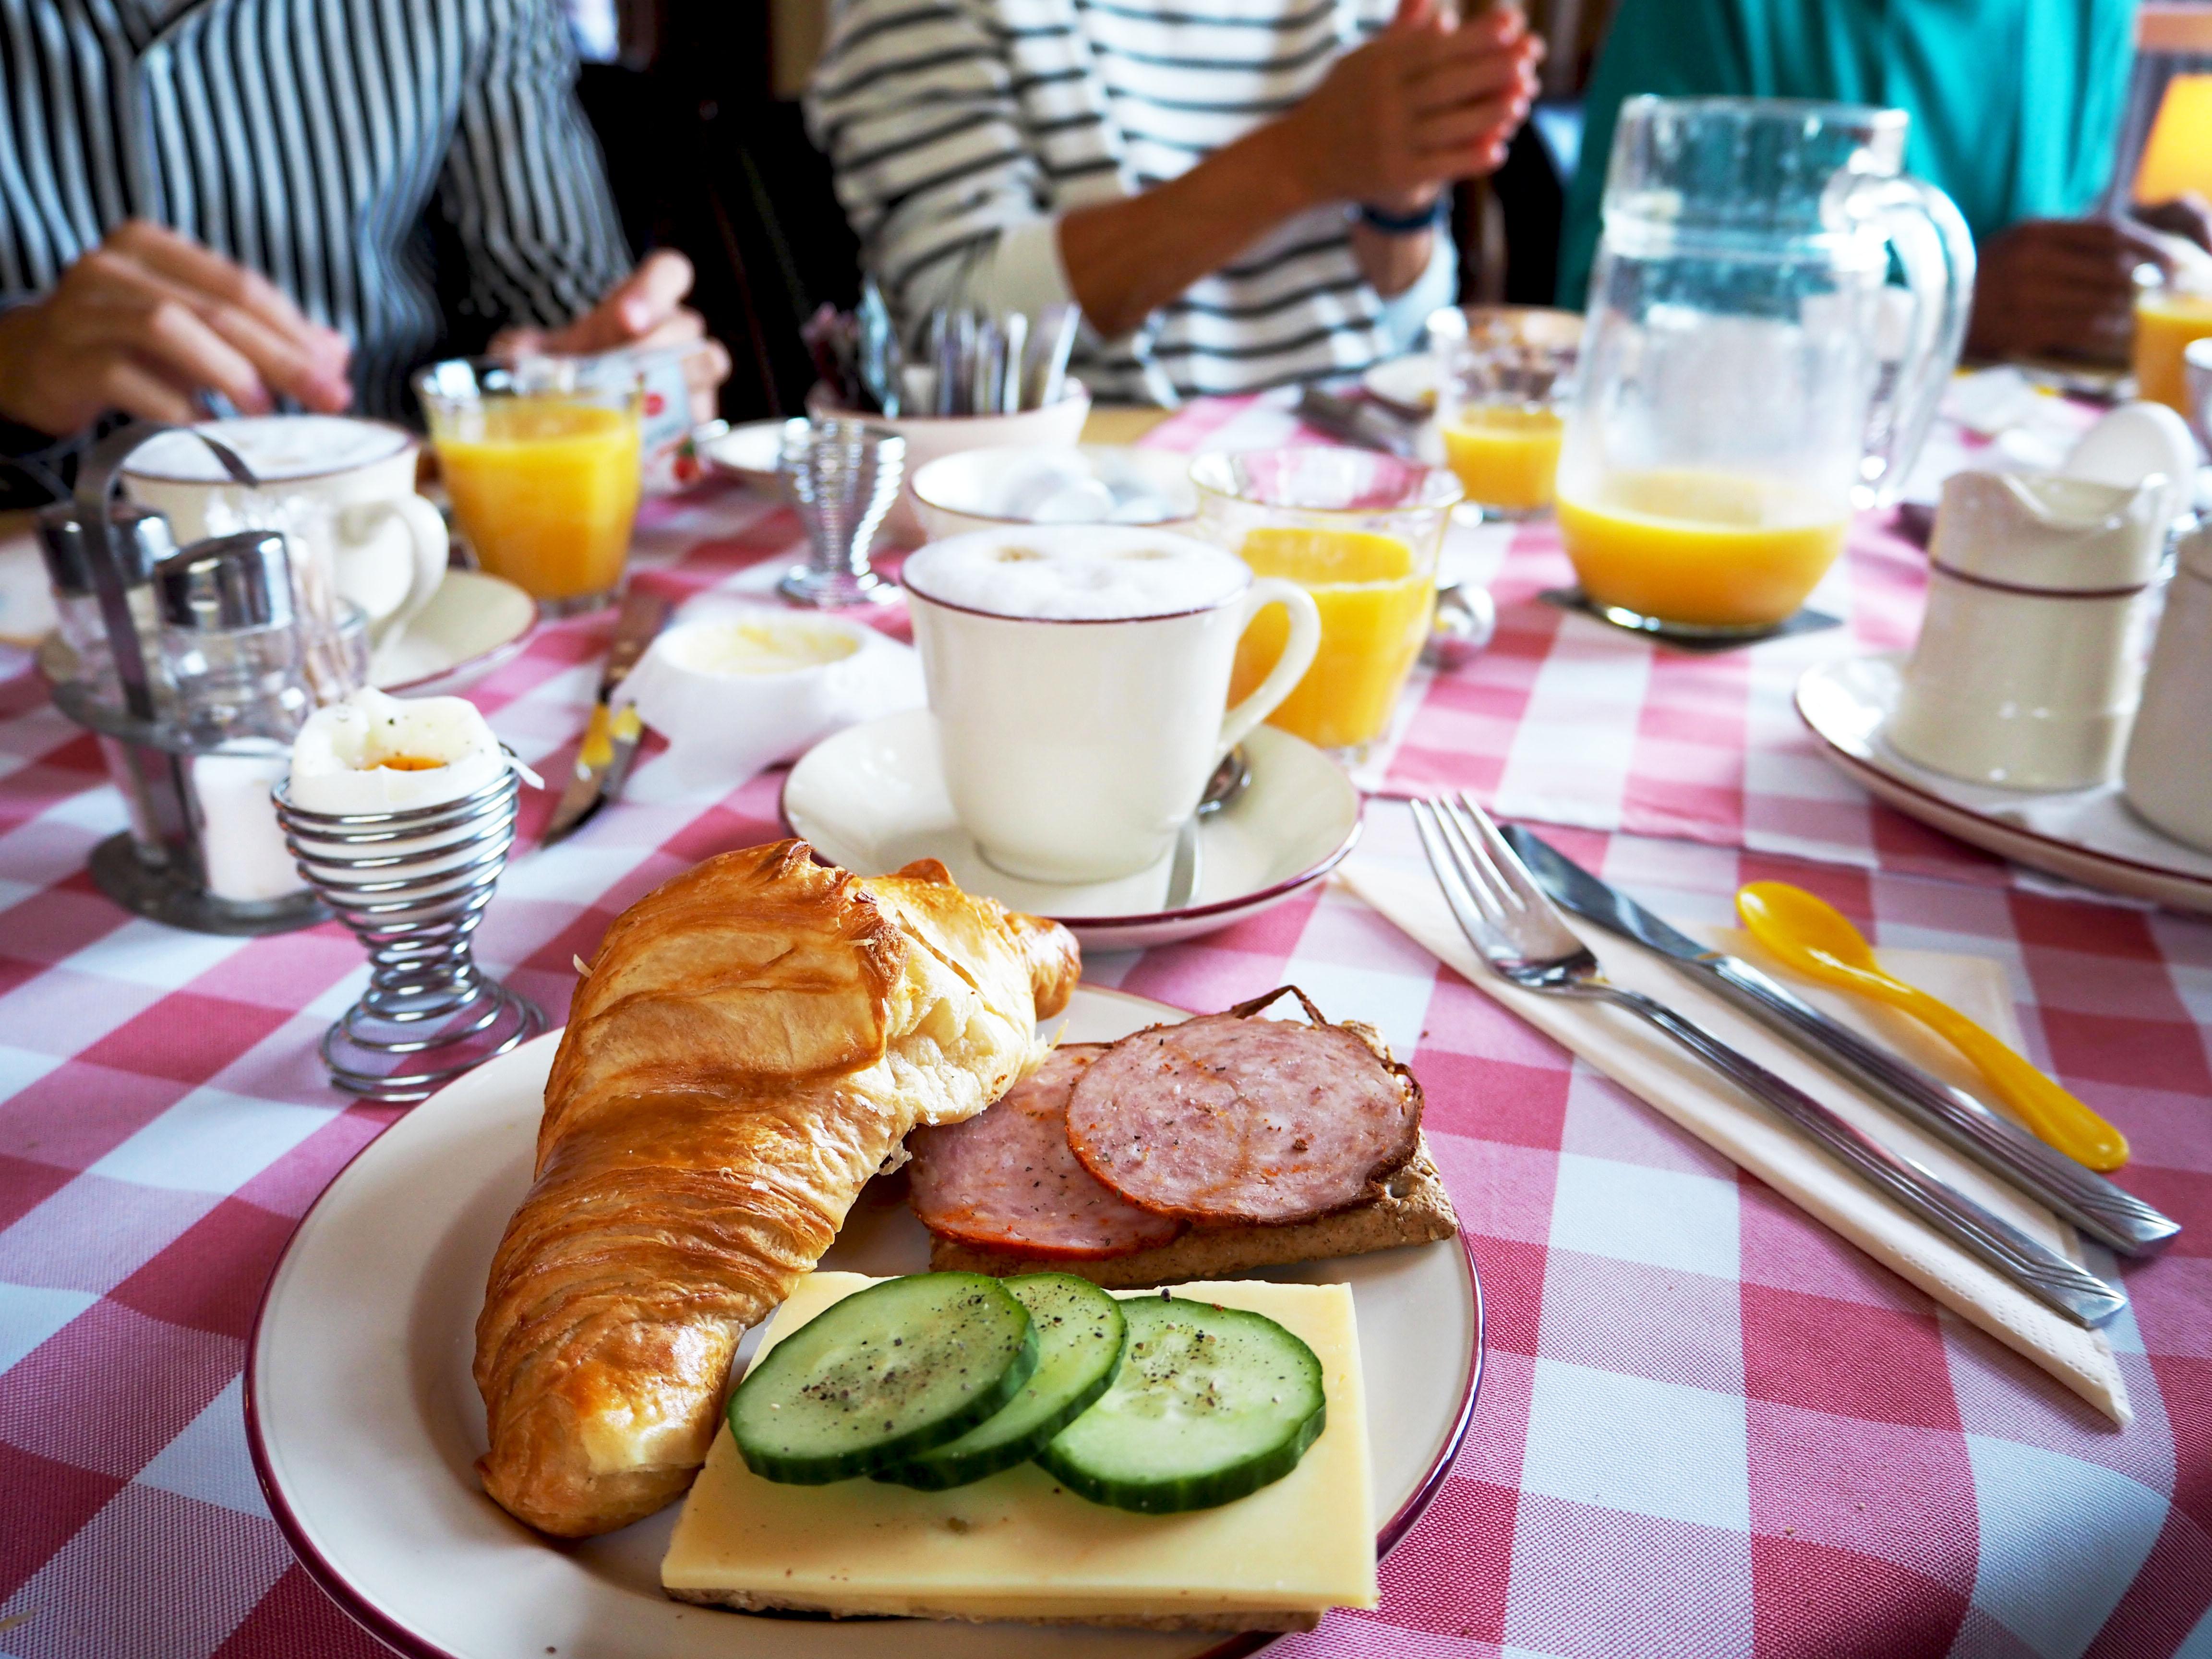 herberg schoapendrift ontbijt